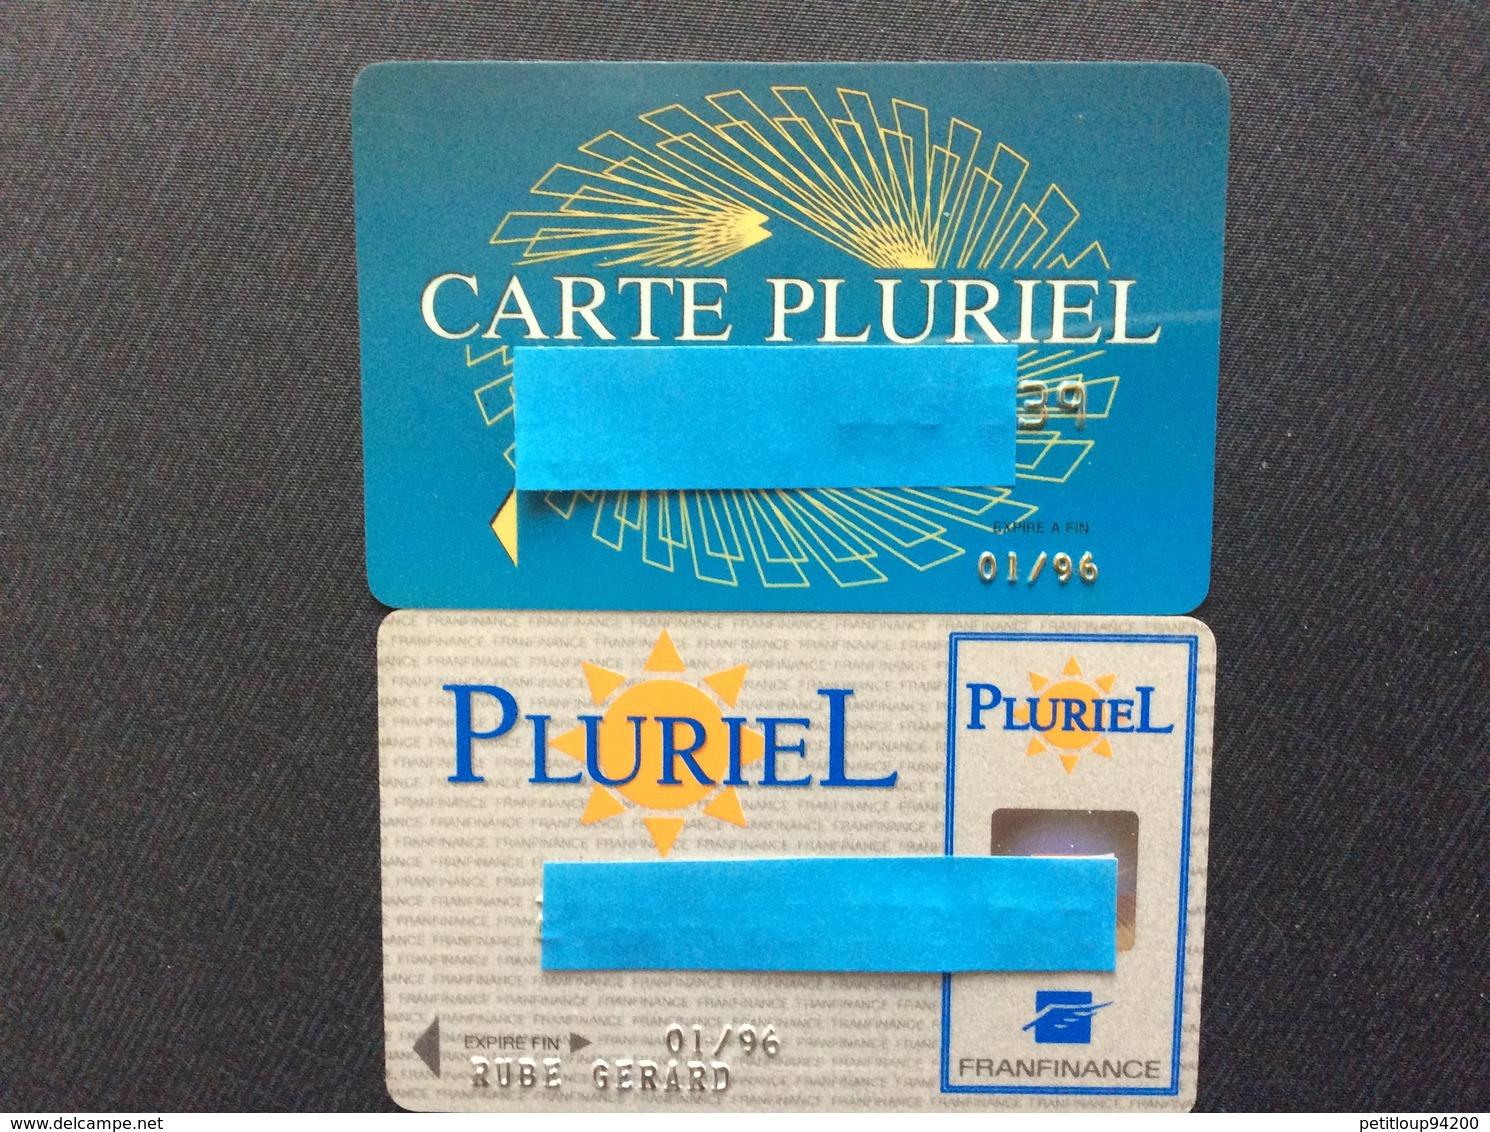 2 CARTES DE CRÉDIT  FRANFINANCE  Cartes Pluriel - Geldkarten (Ablauf Min. 10 Jahre)